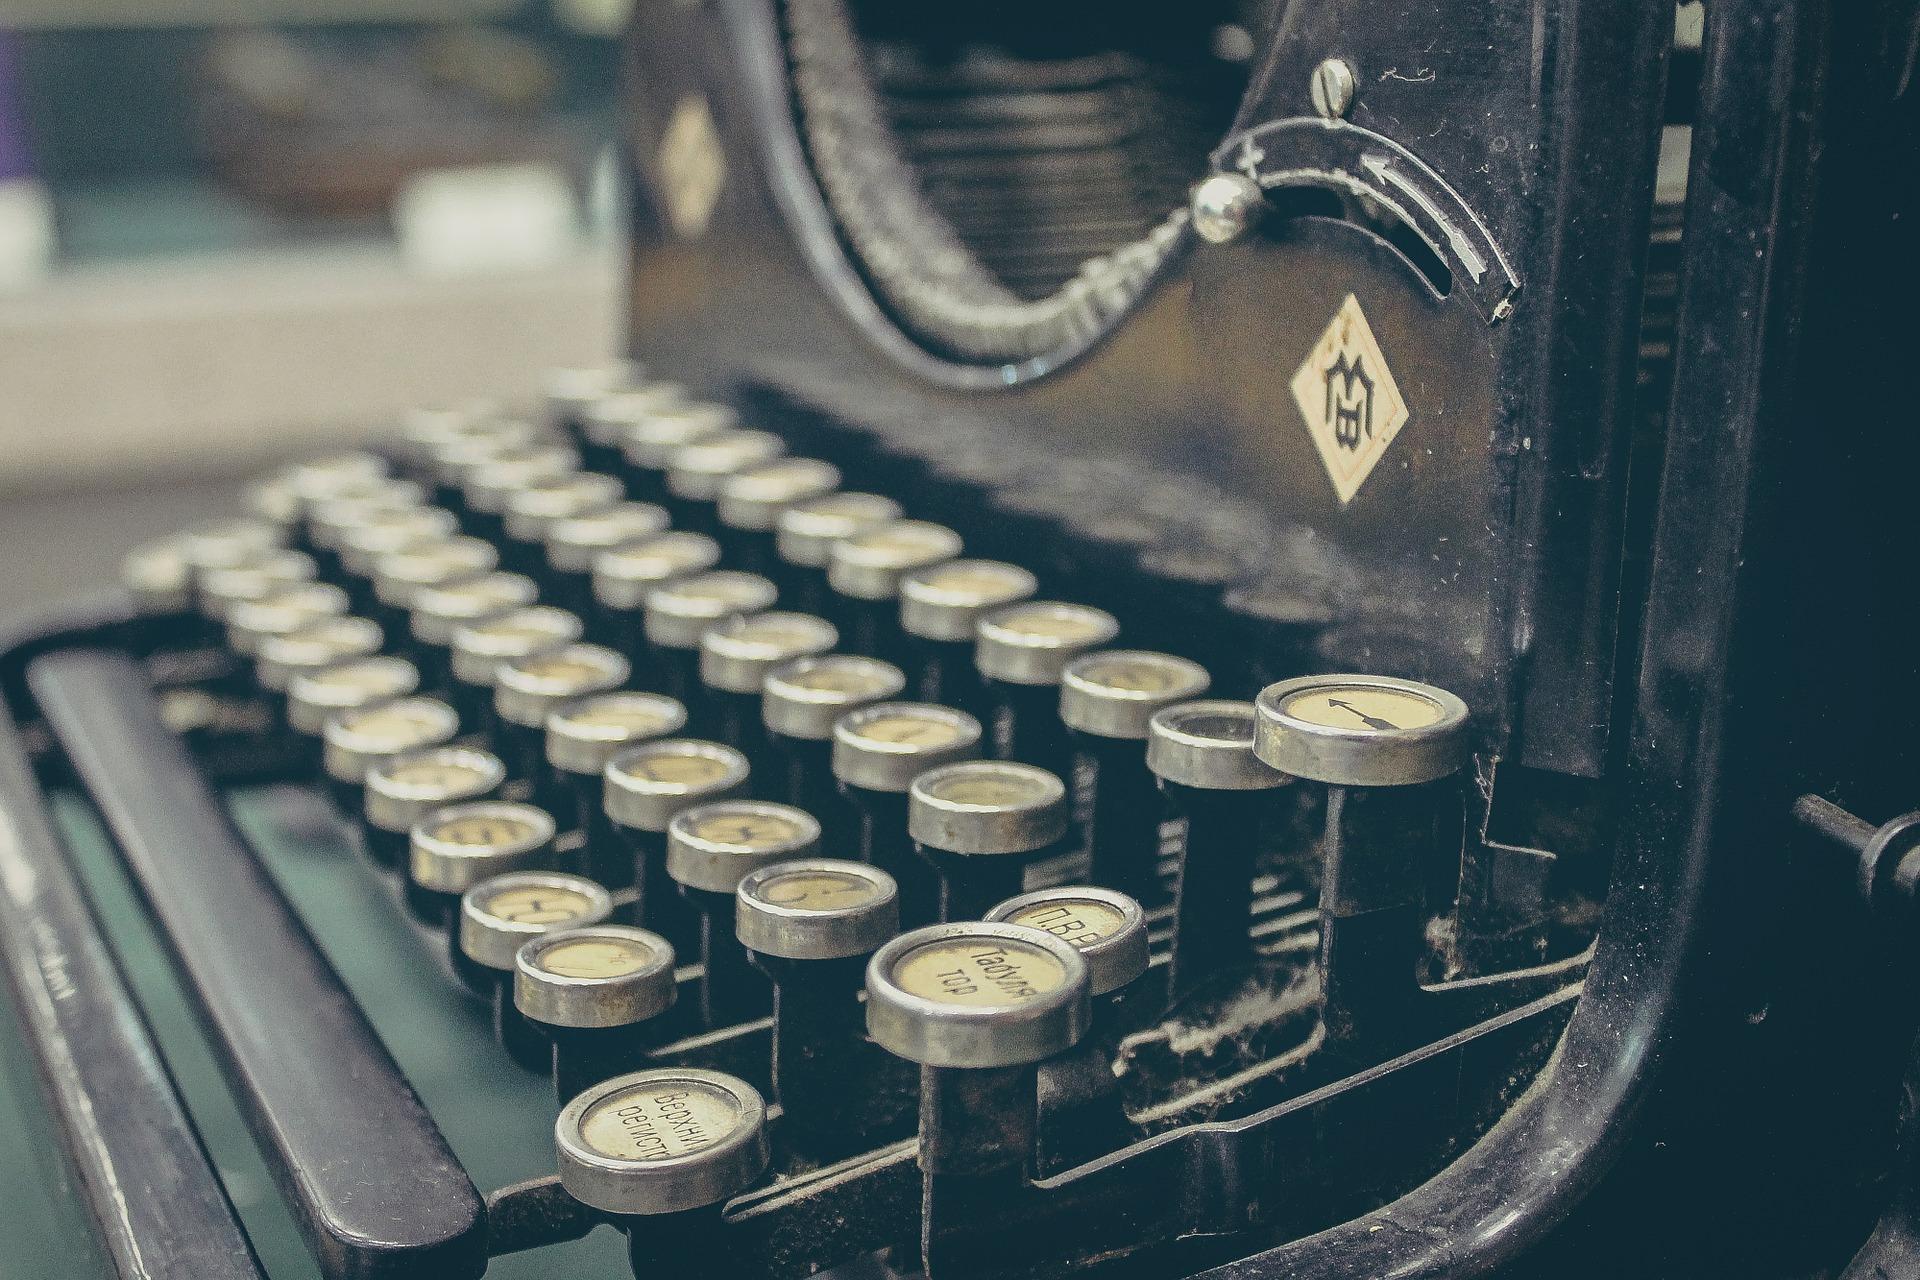 Typewriter for writing a book